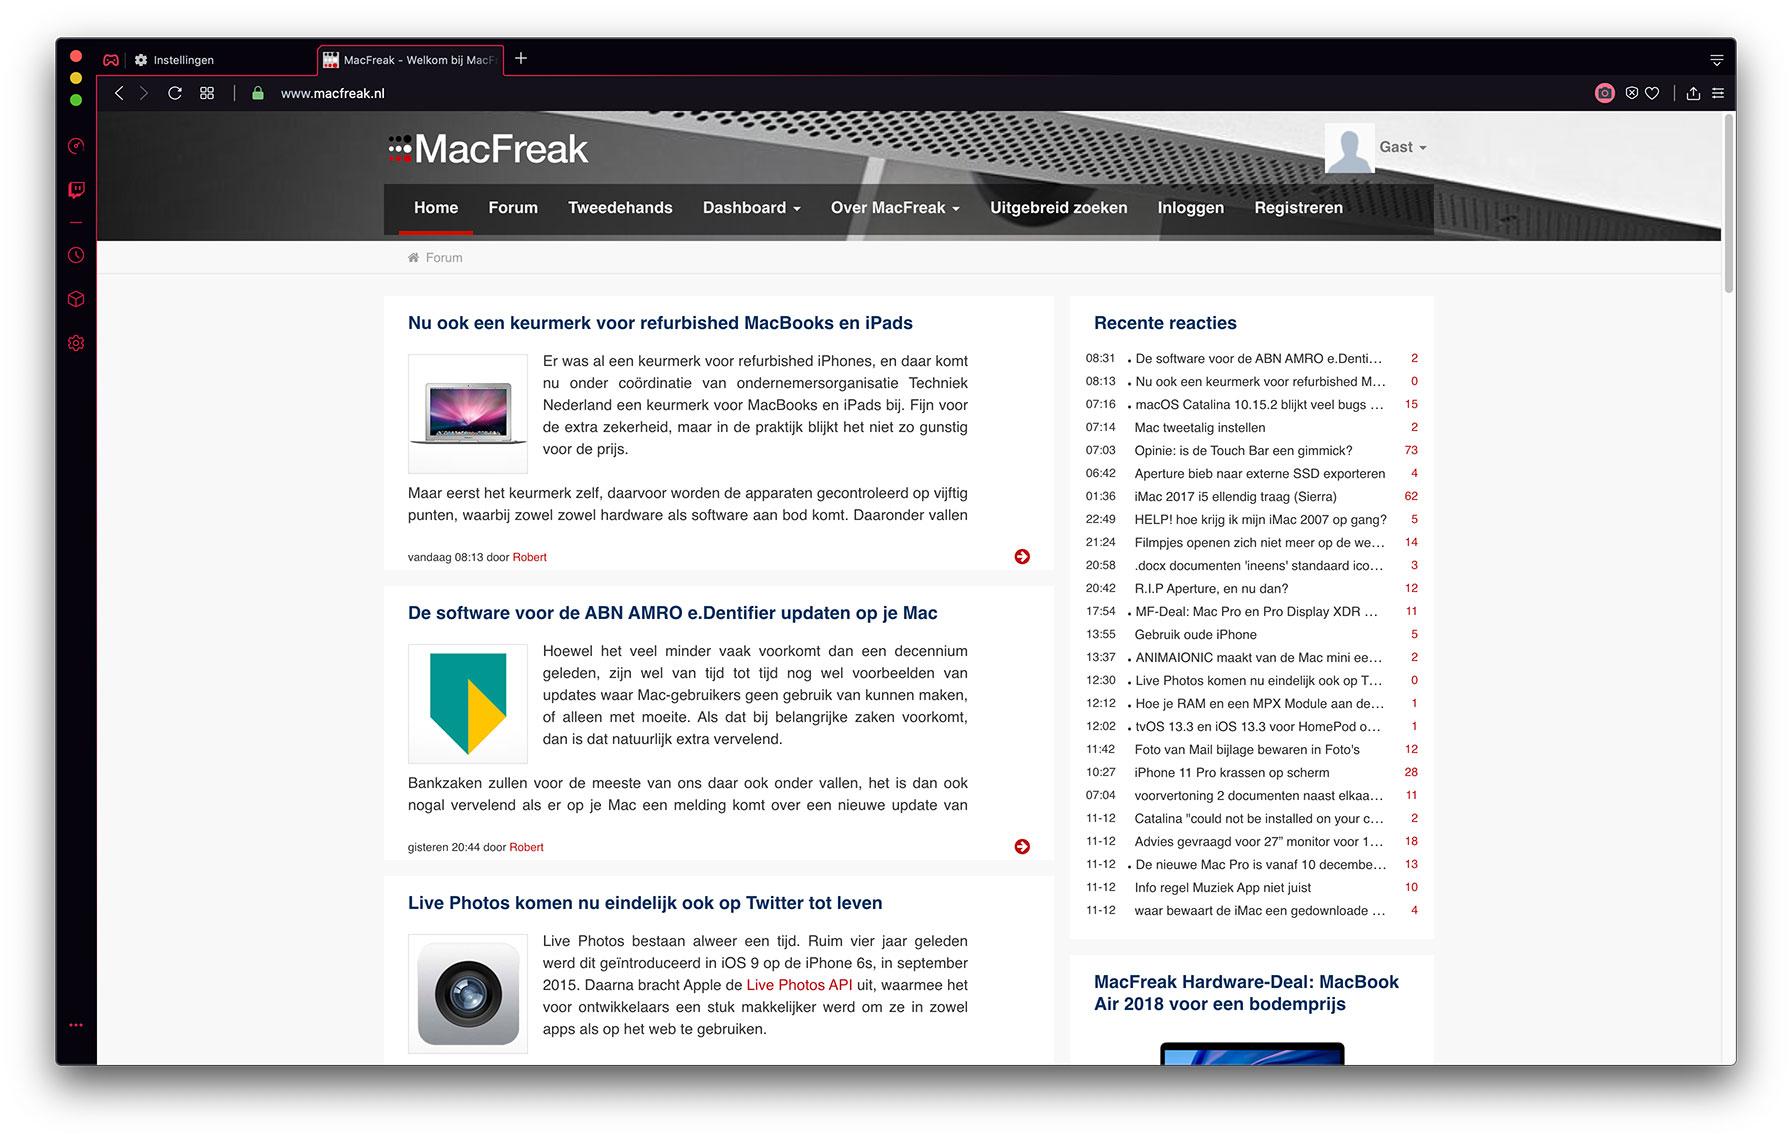 https://www.macfreak.nl/modules/news/images/zArt.OperaGX-1.jpg